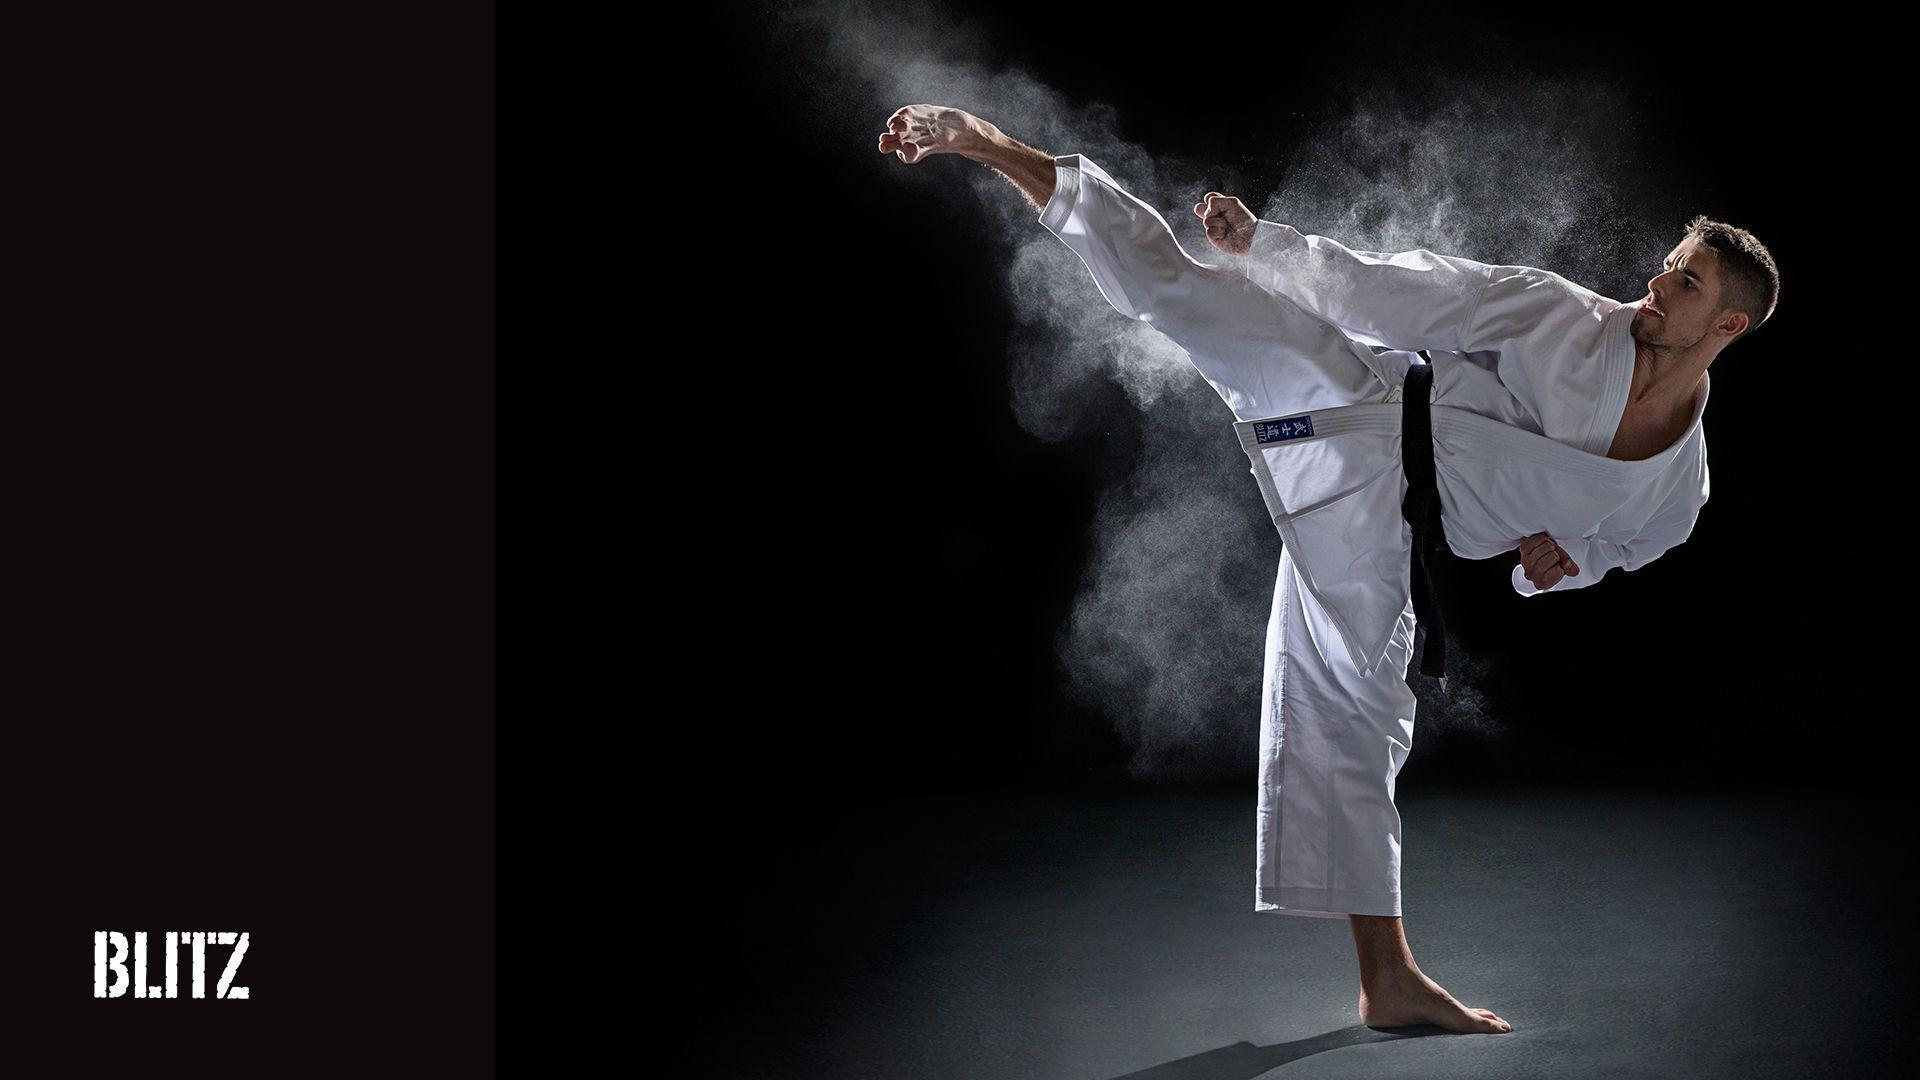 Martial Arts Wallpapers Top Free Martial Arts Backgrounds Wallpaperaccess